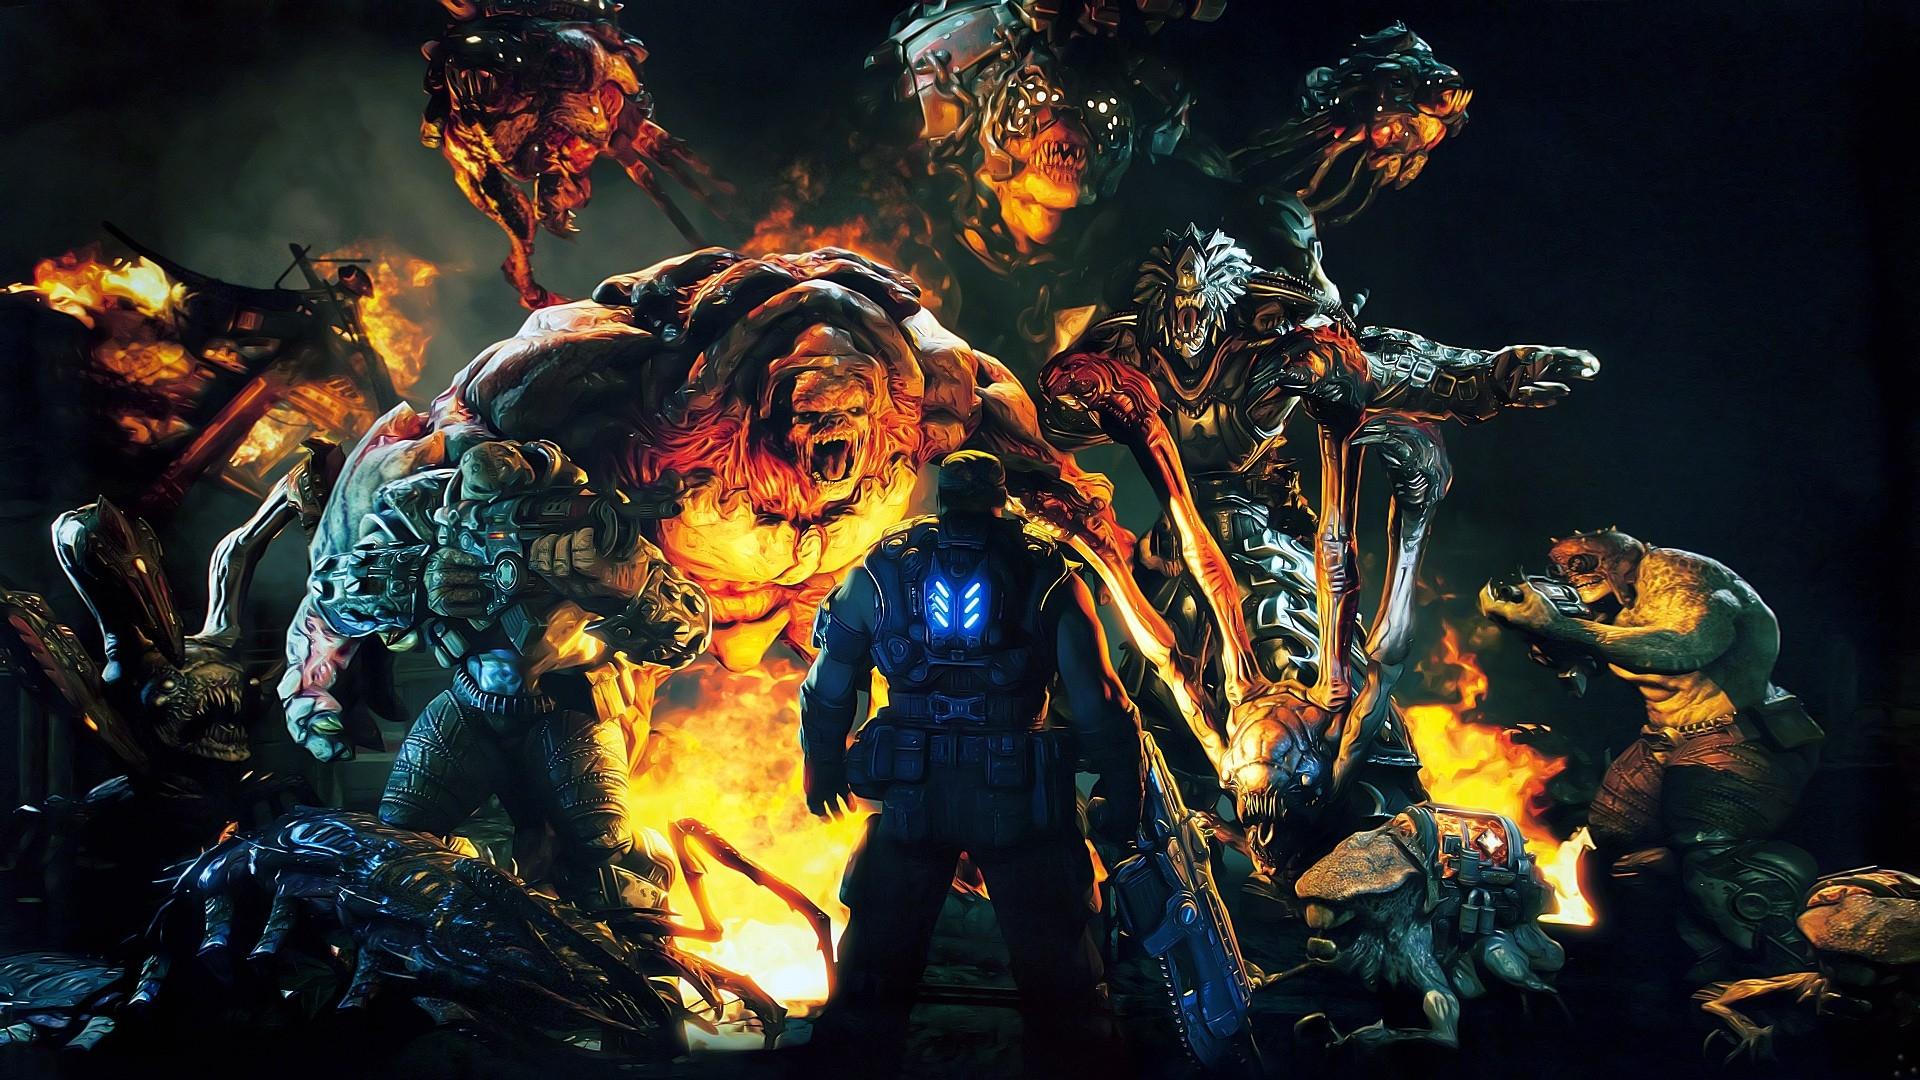 Universal Studios ya prepara película de Gears of War